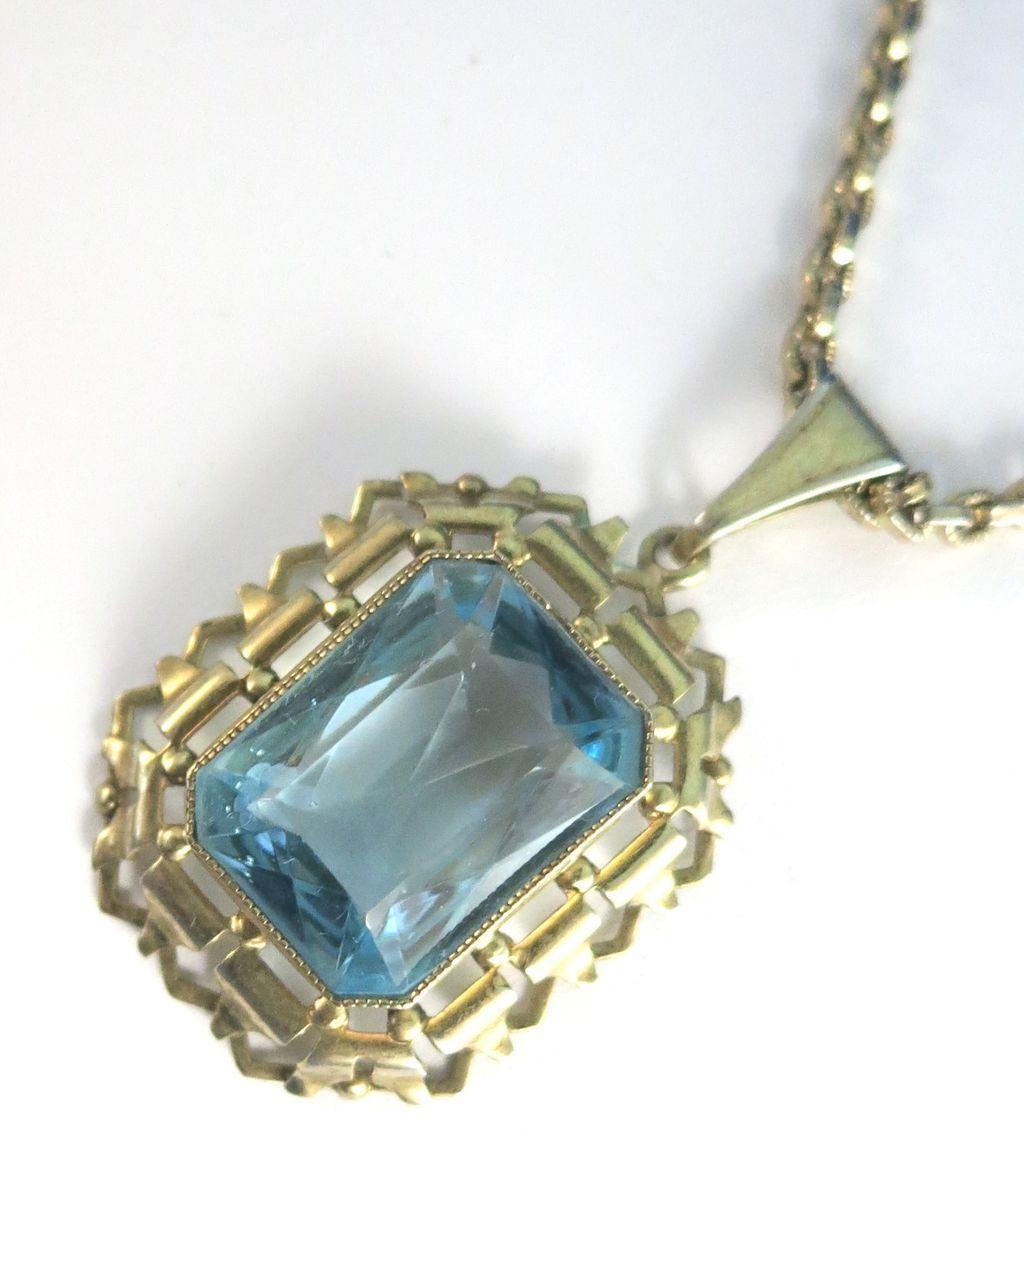 VINTAGE Whiting and Davis Chain and Aquamarine Pendant